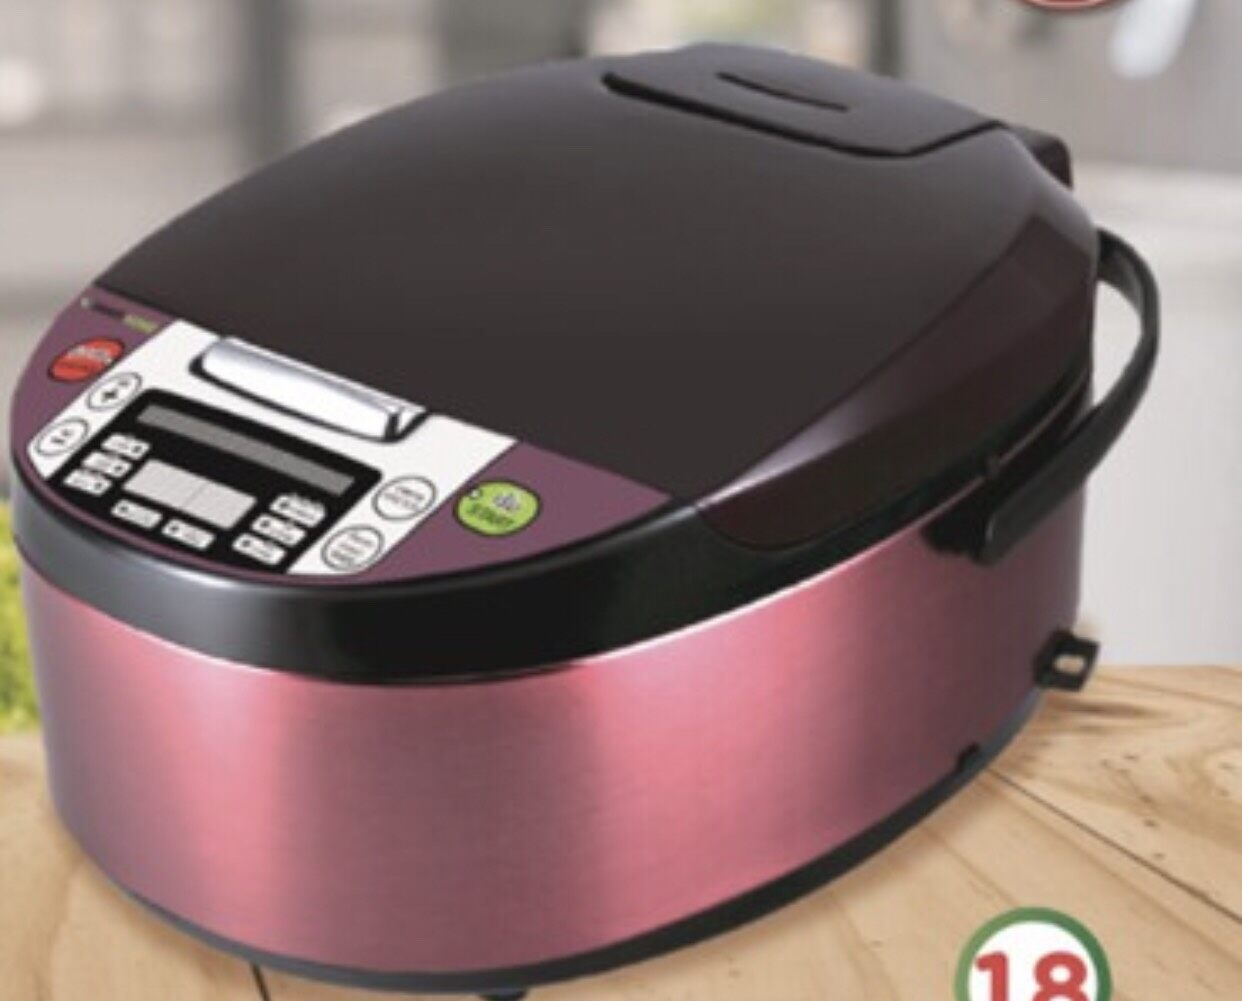 SMARTHOME Digital rice cooker หม้อหุงข้าวดิจิตอล รุ่น SM-RCD903